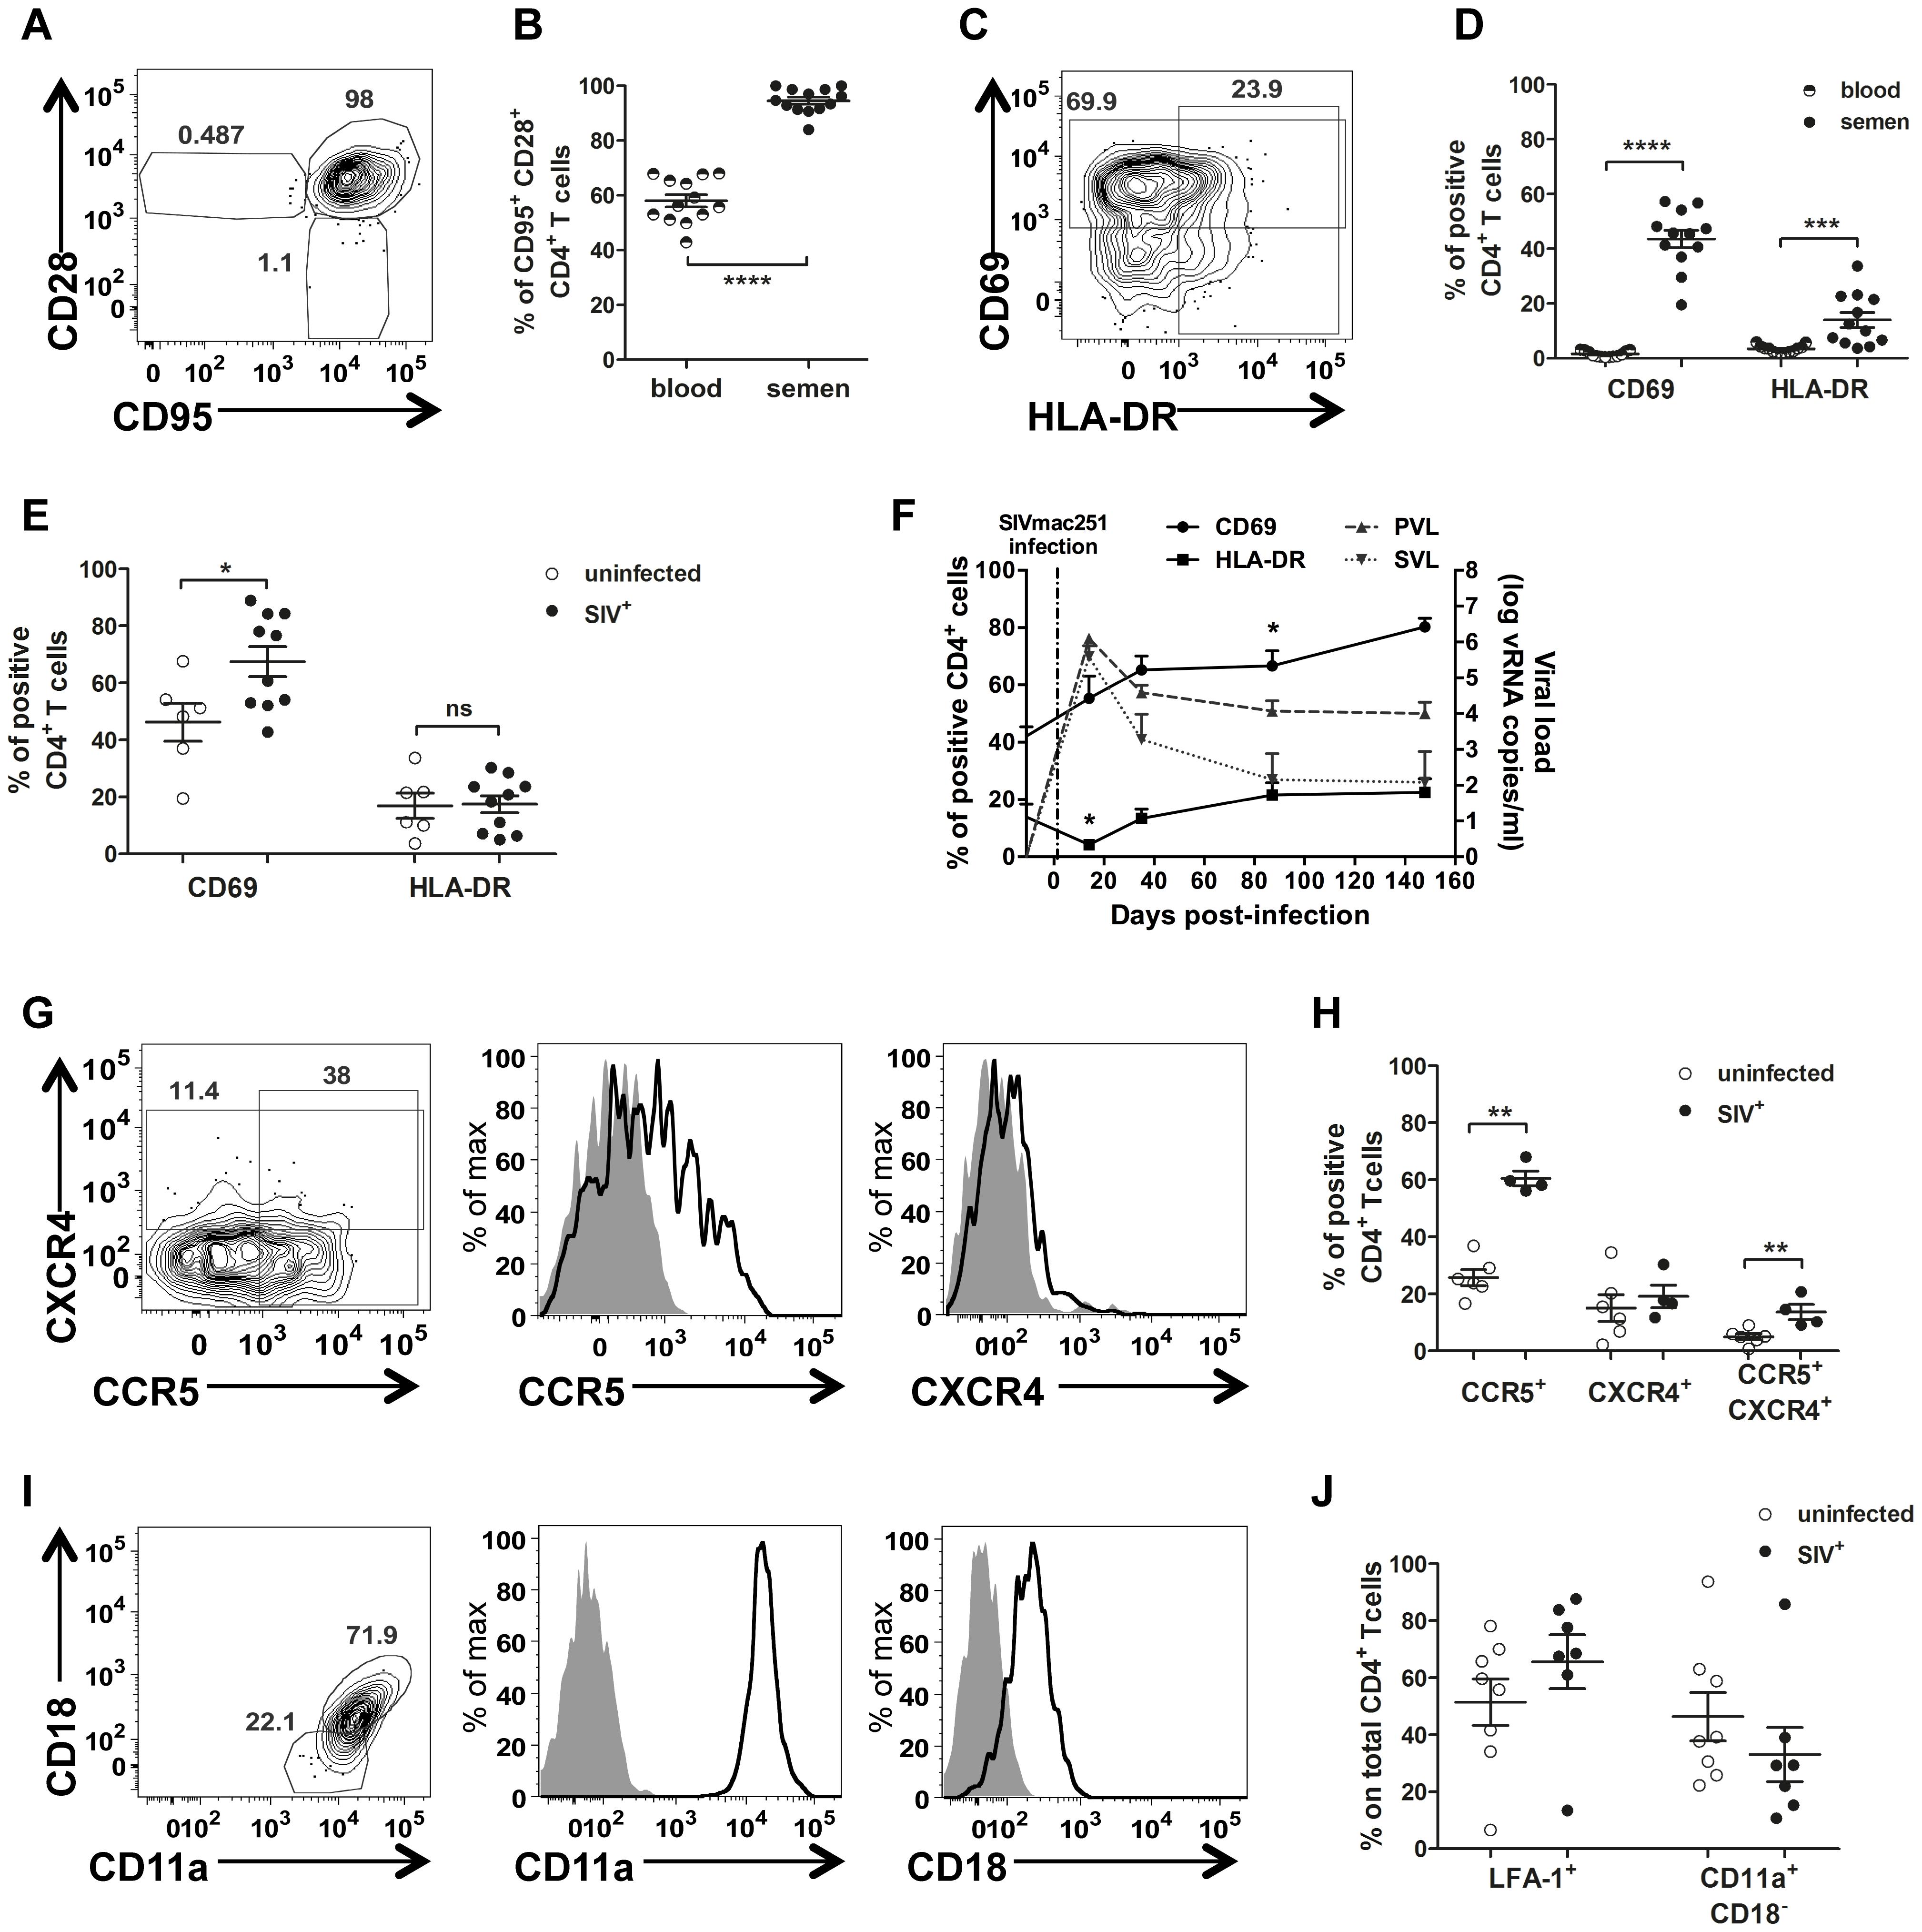 Semen CD4<sup>+</sup> T-cell phenotype.